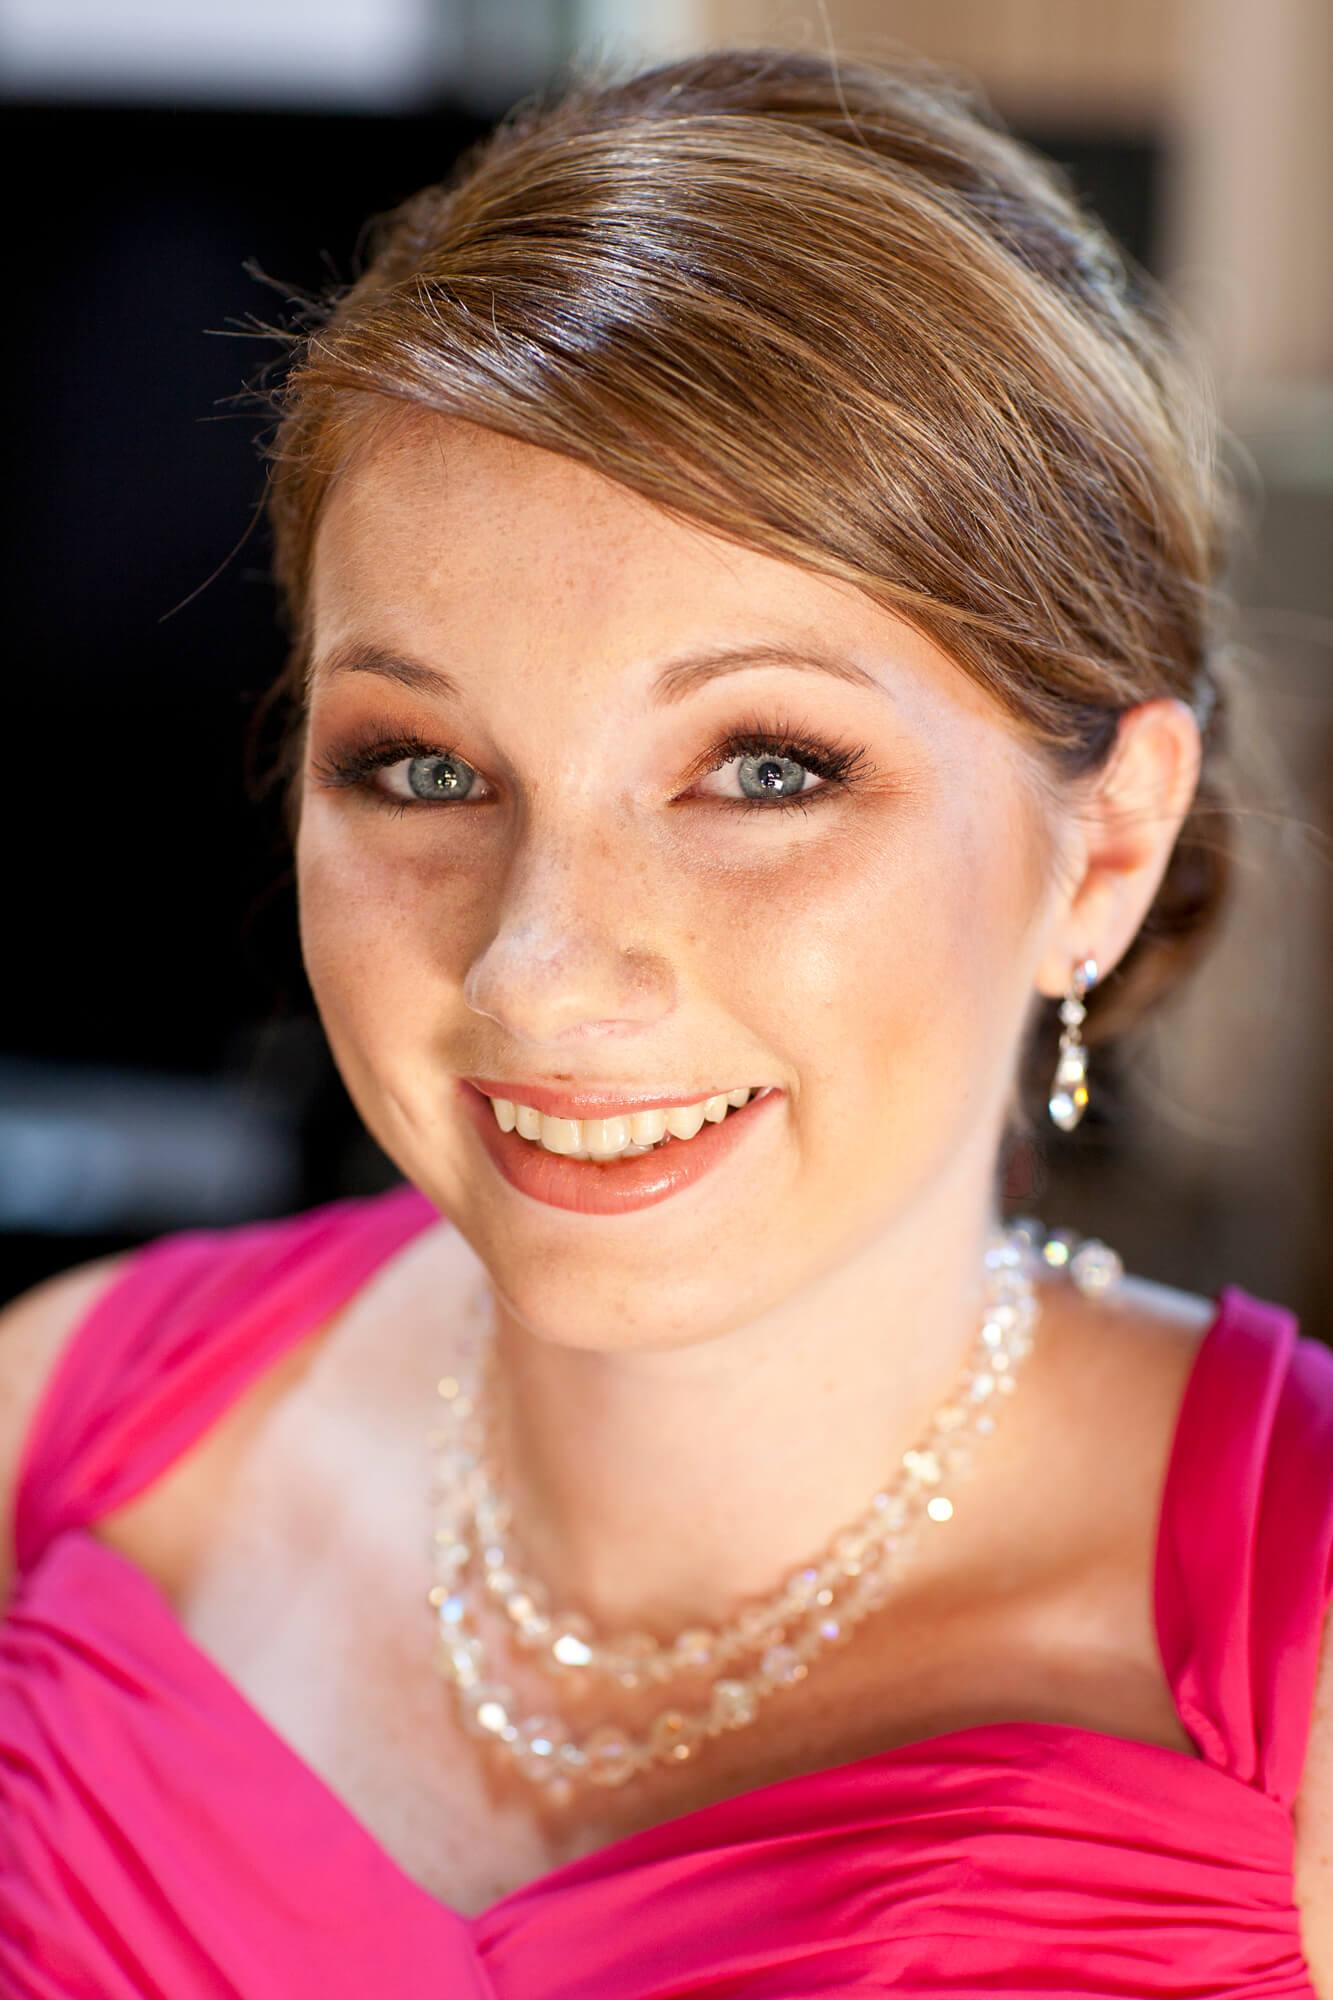 The Decorated Bride - Erika 22.jpg